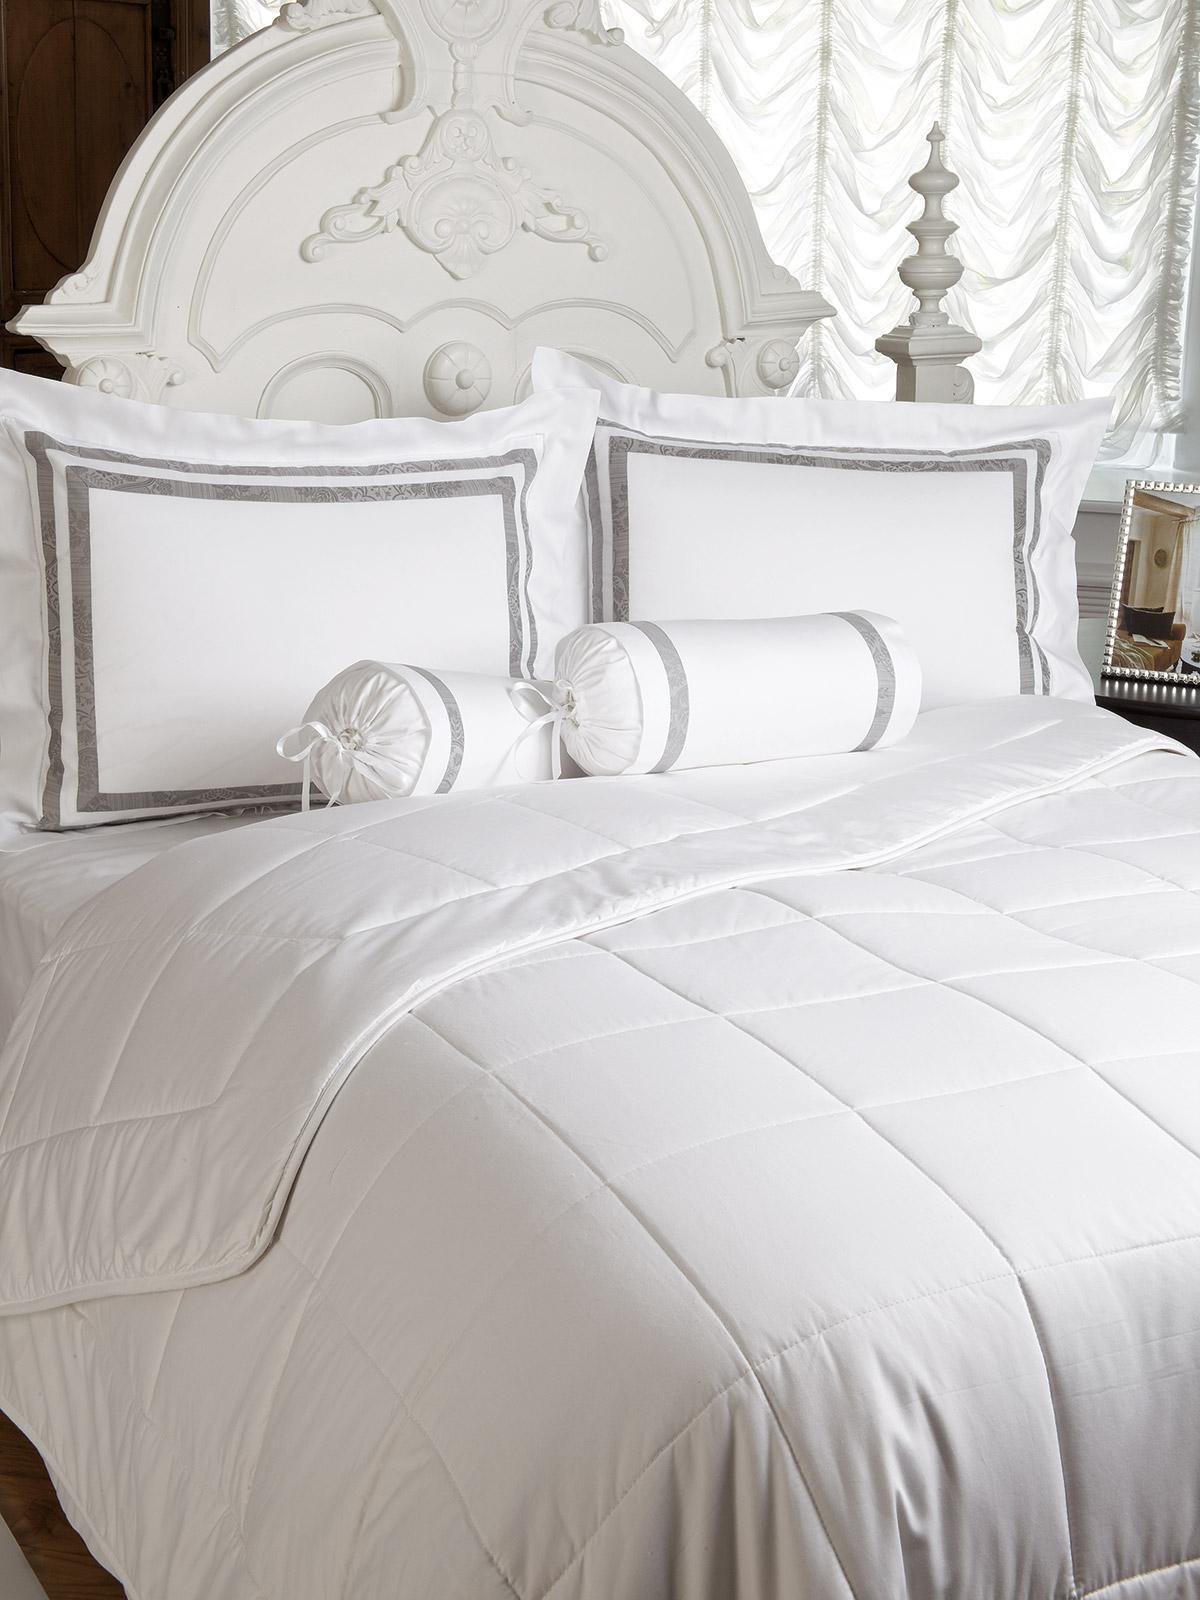 Washable Cotton Filled Comforter